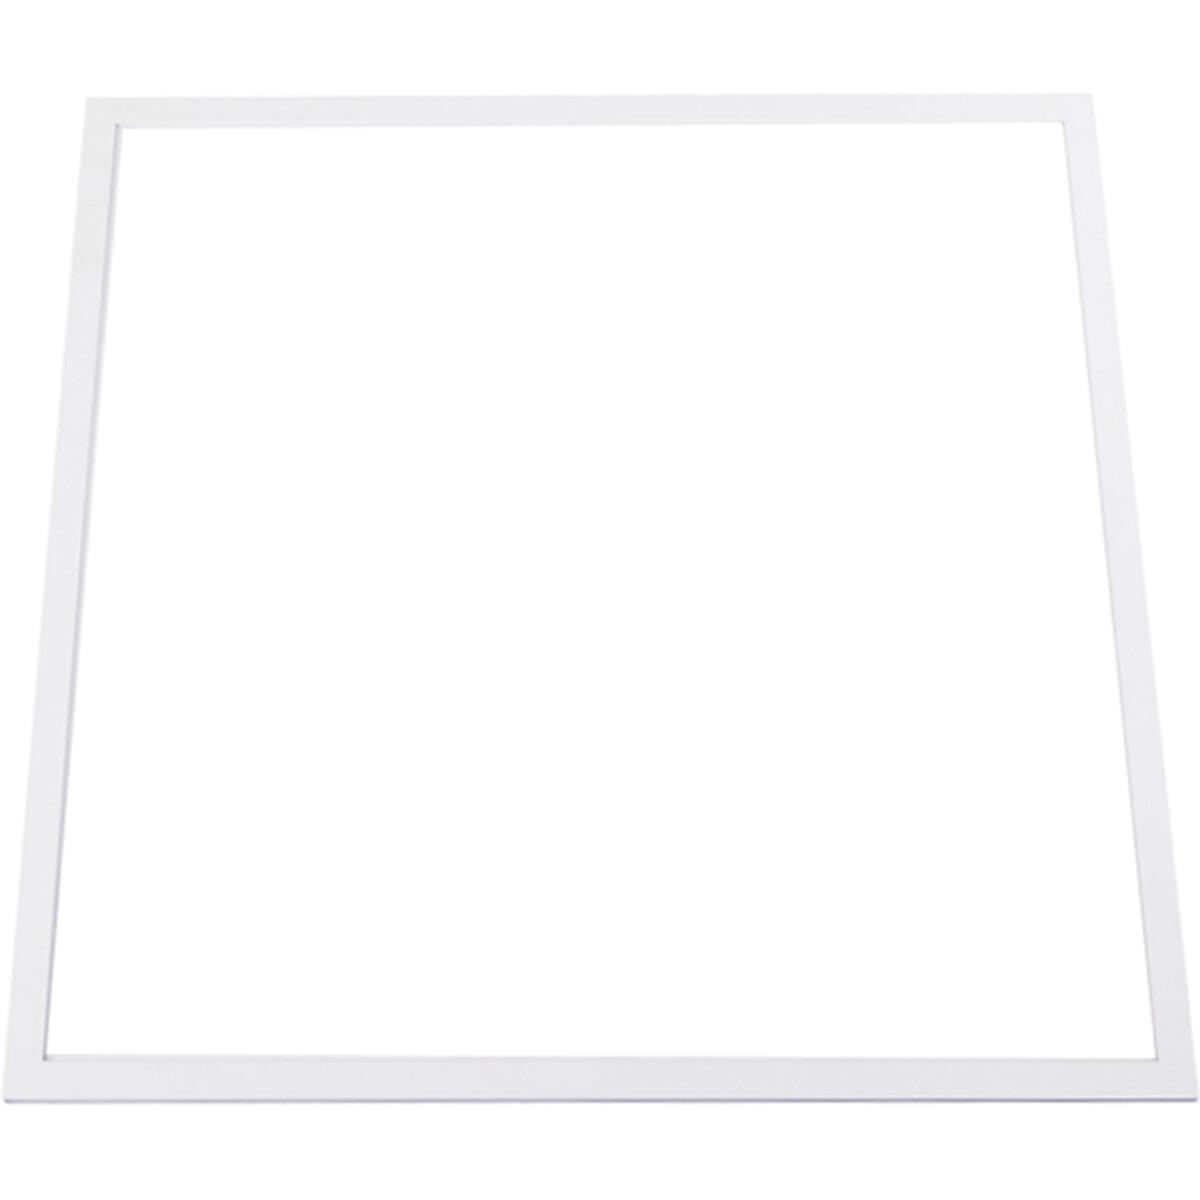 LED Paneel - Aigi - 60x60 Helder/Koud Wit 6000K - 50W Inbouw Vierkant - Mat Wit - Aluminium - Flikkervrij